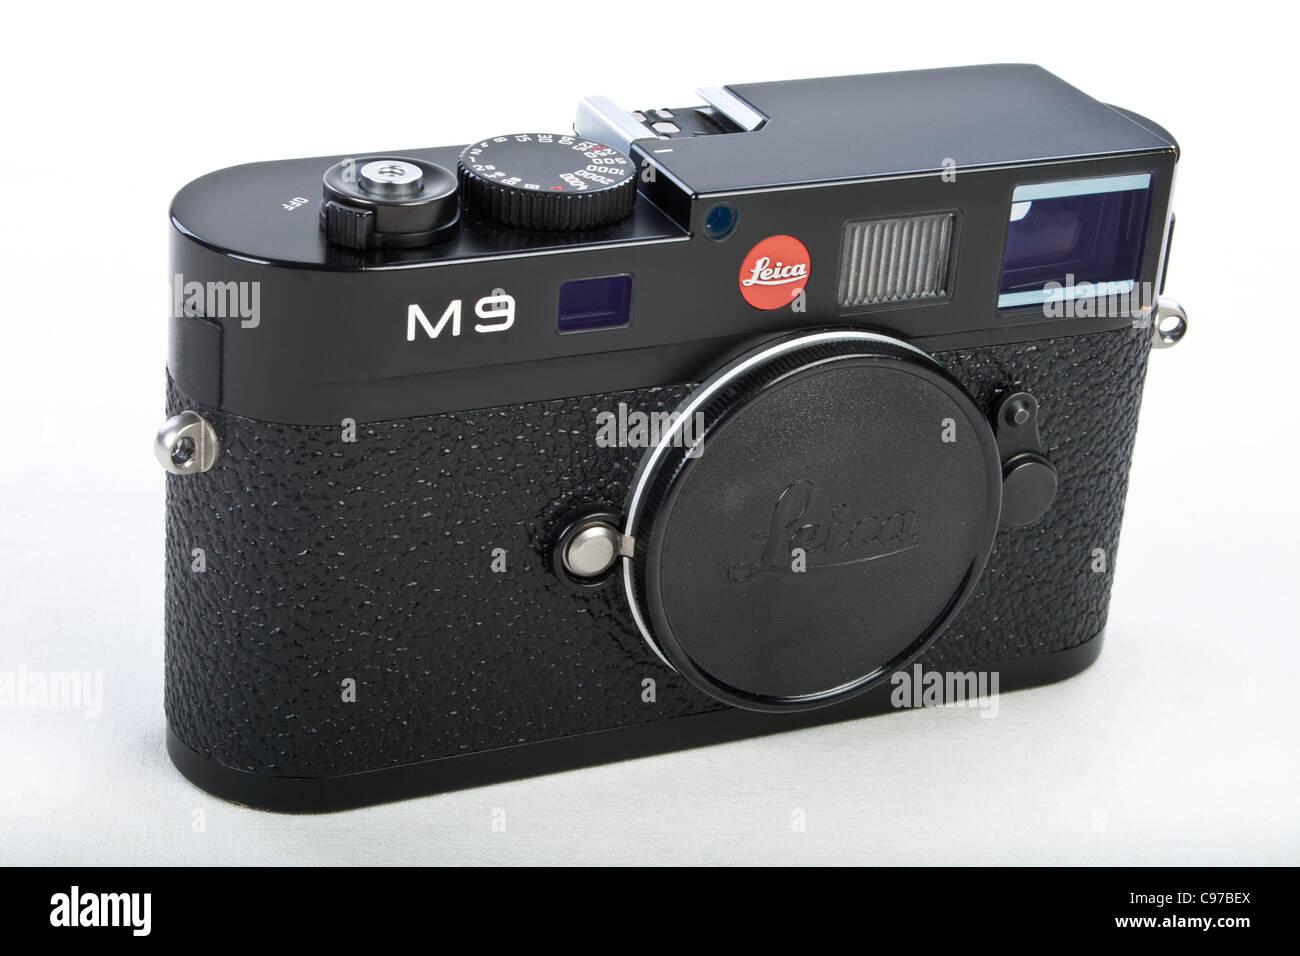 LEICA M9 Digital Rangefinder Camera Body - Stock Image